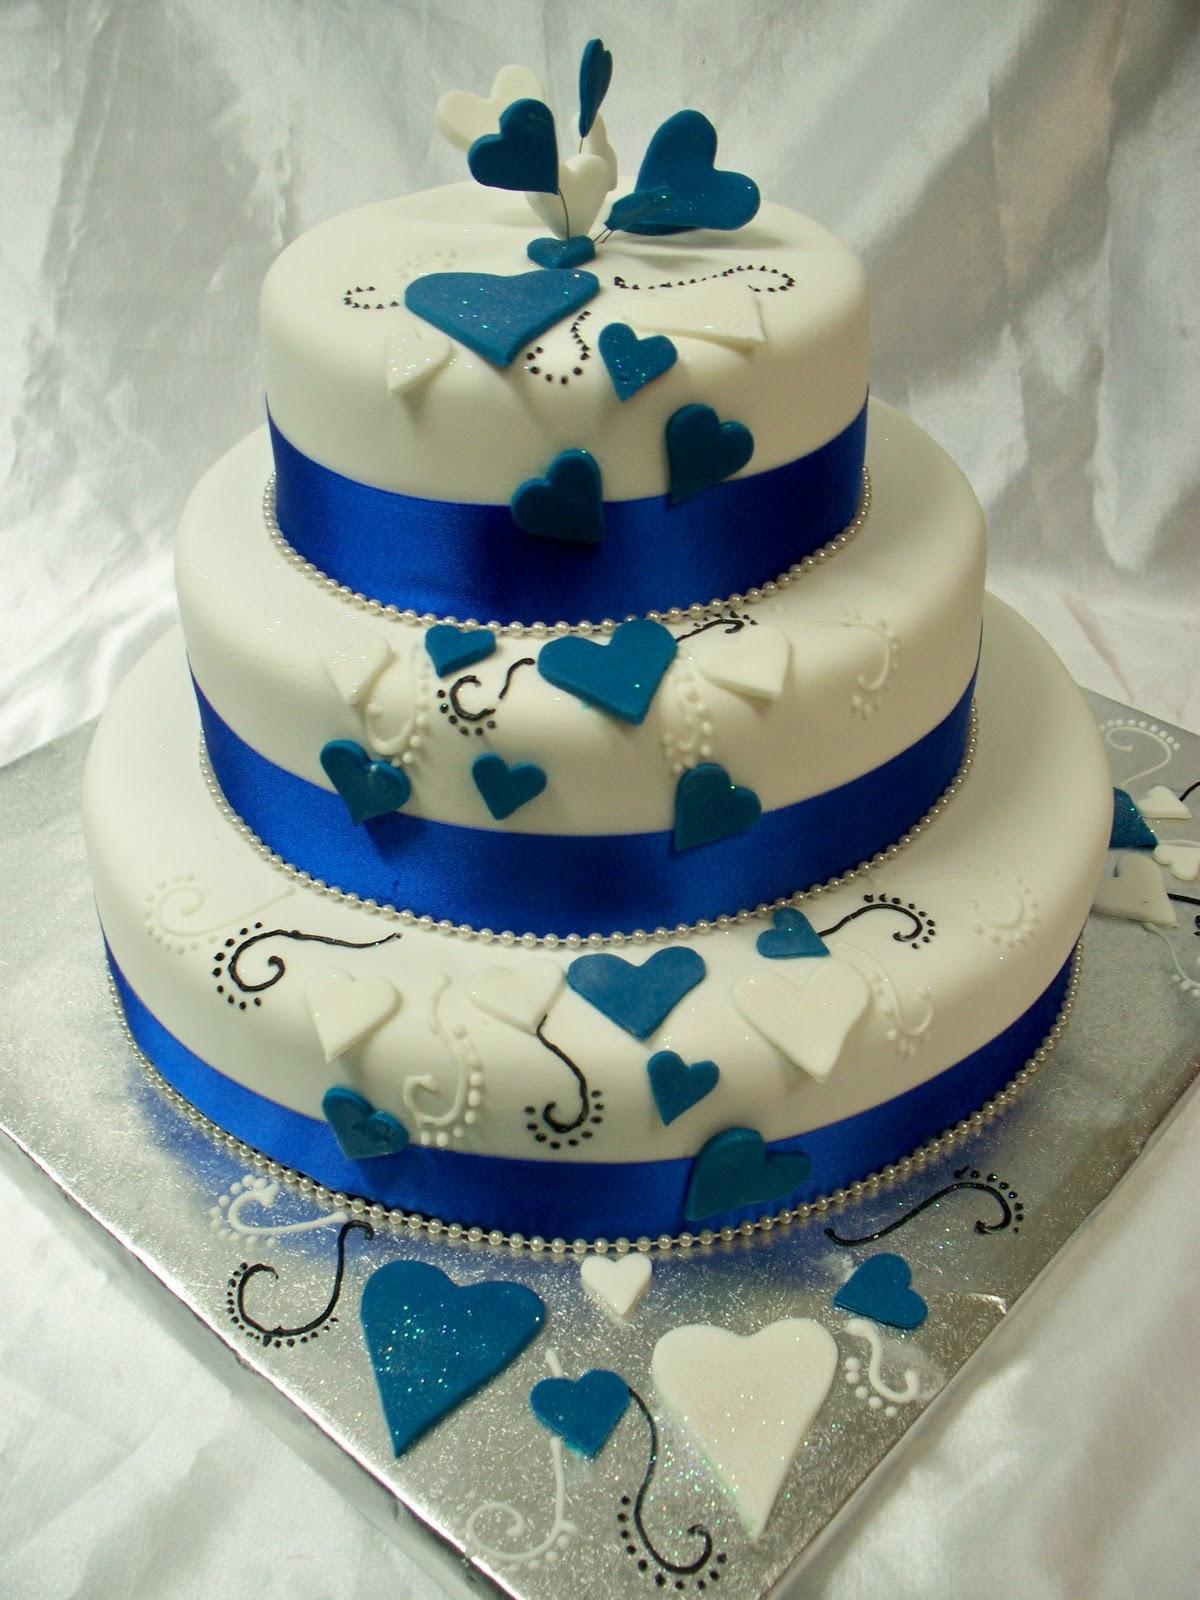 Fresco Foods Cakes: AFFORDABLE WEDDING CAKES